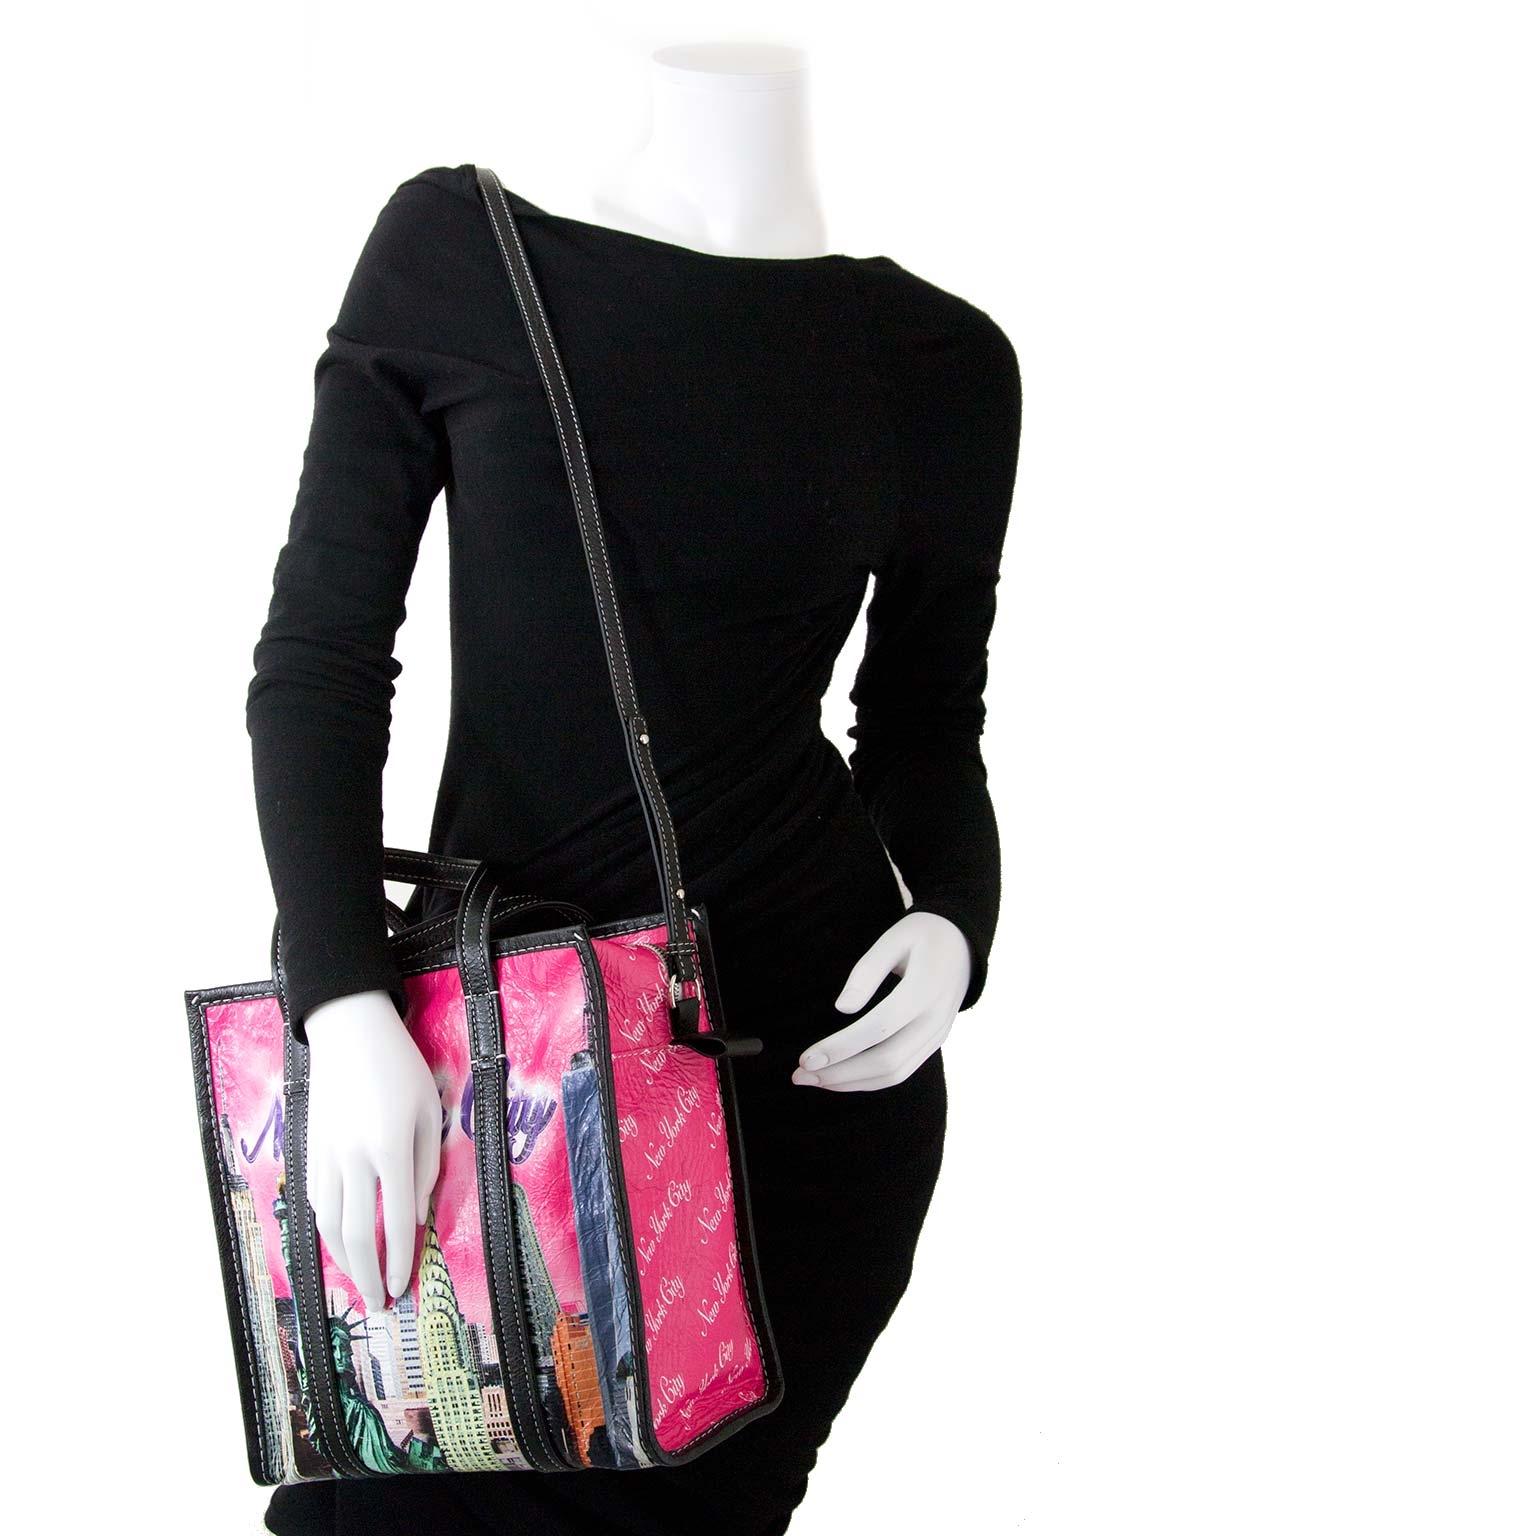 9b1ca61c53a Labellov Buy authentic vintagePrada designer bags, shoes, clothes ...